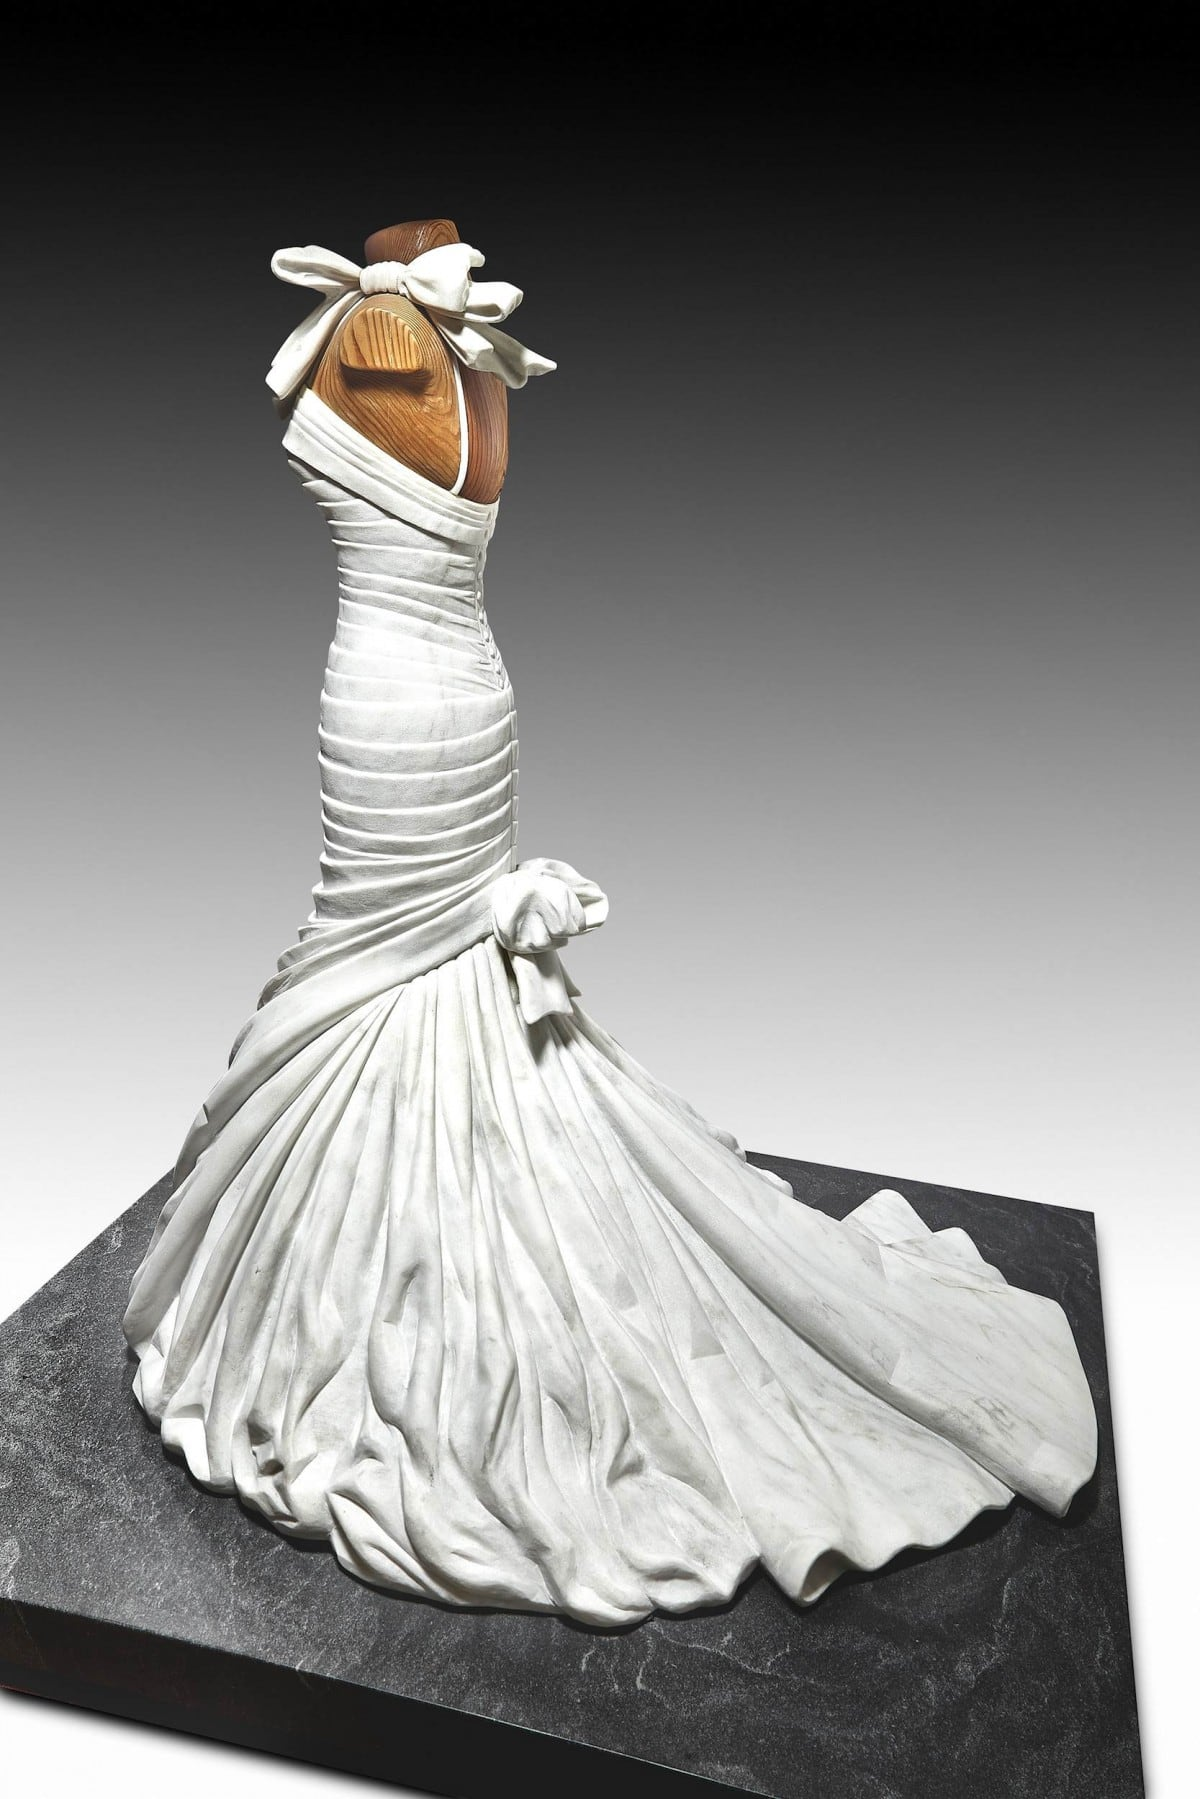 Alasdair-Thomson-Marble-Wedding-Dress-Sculpture-Pnina-Tornai.jpg